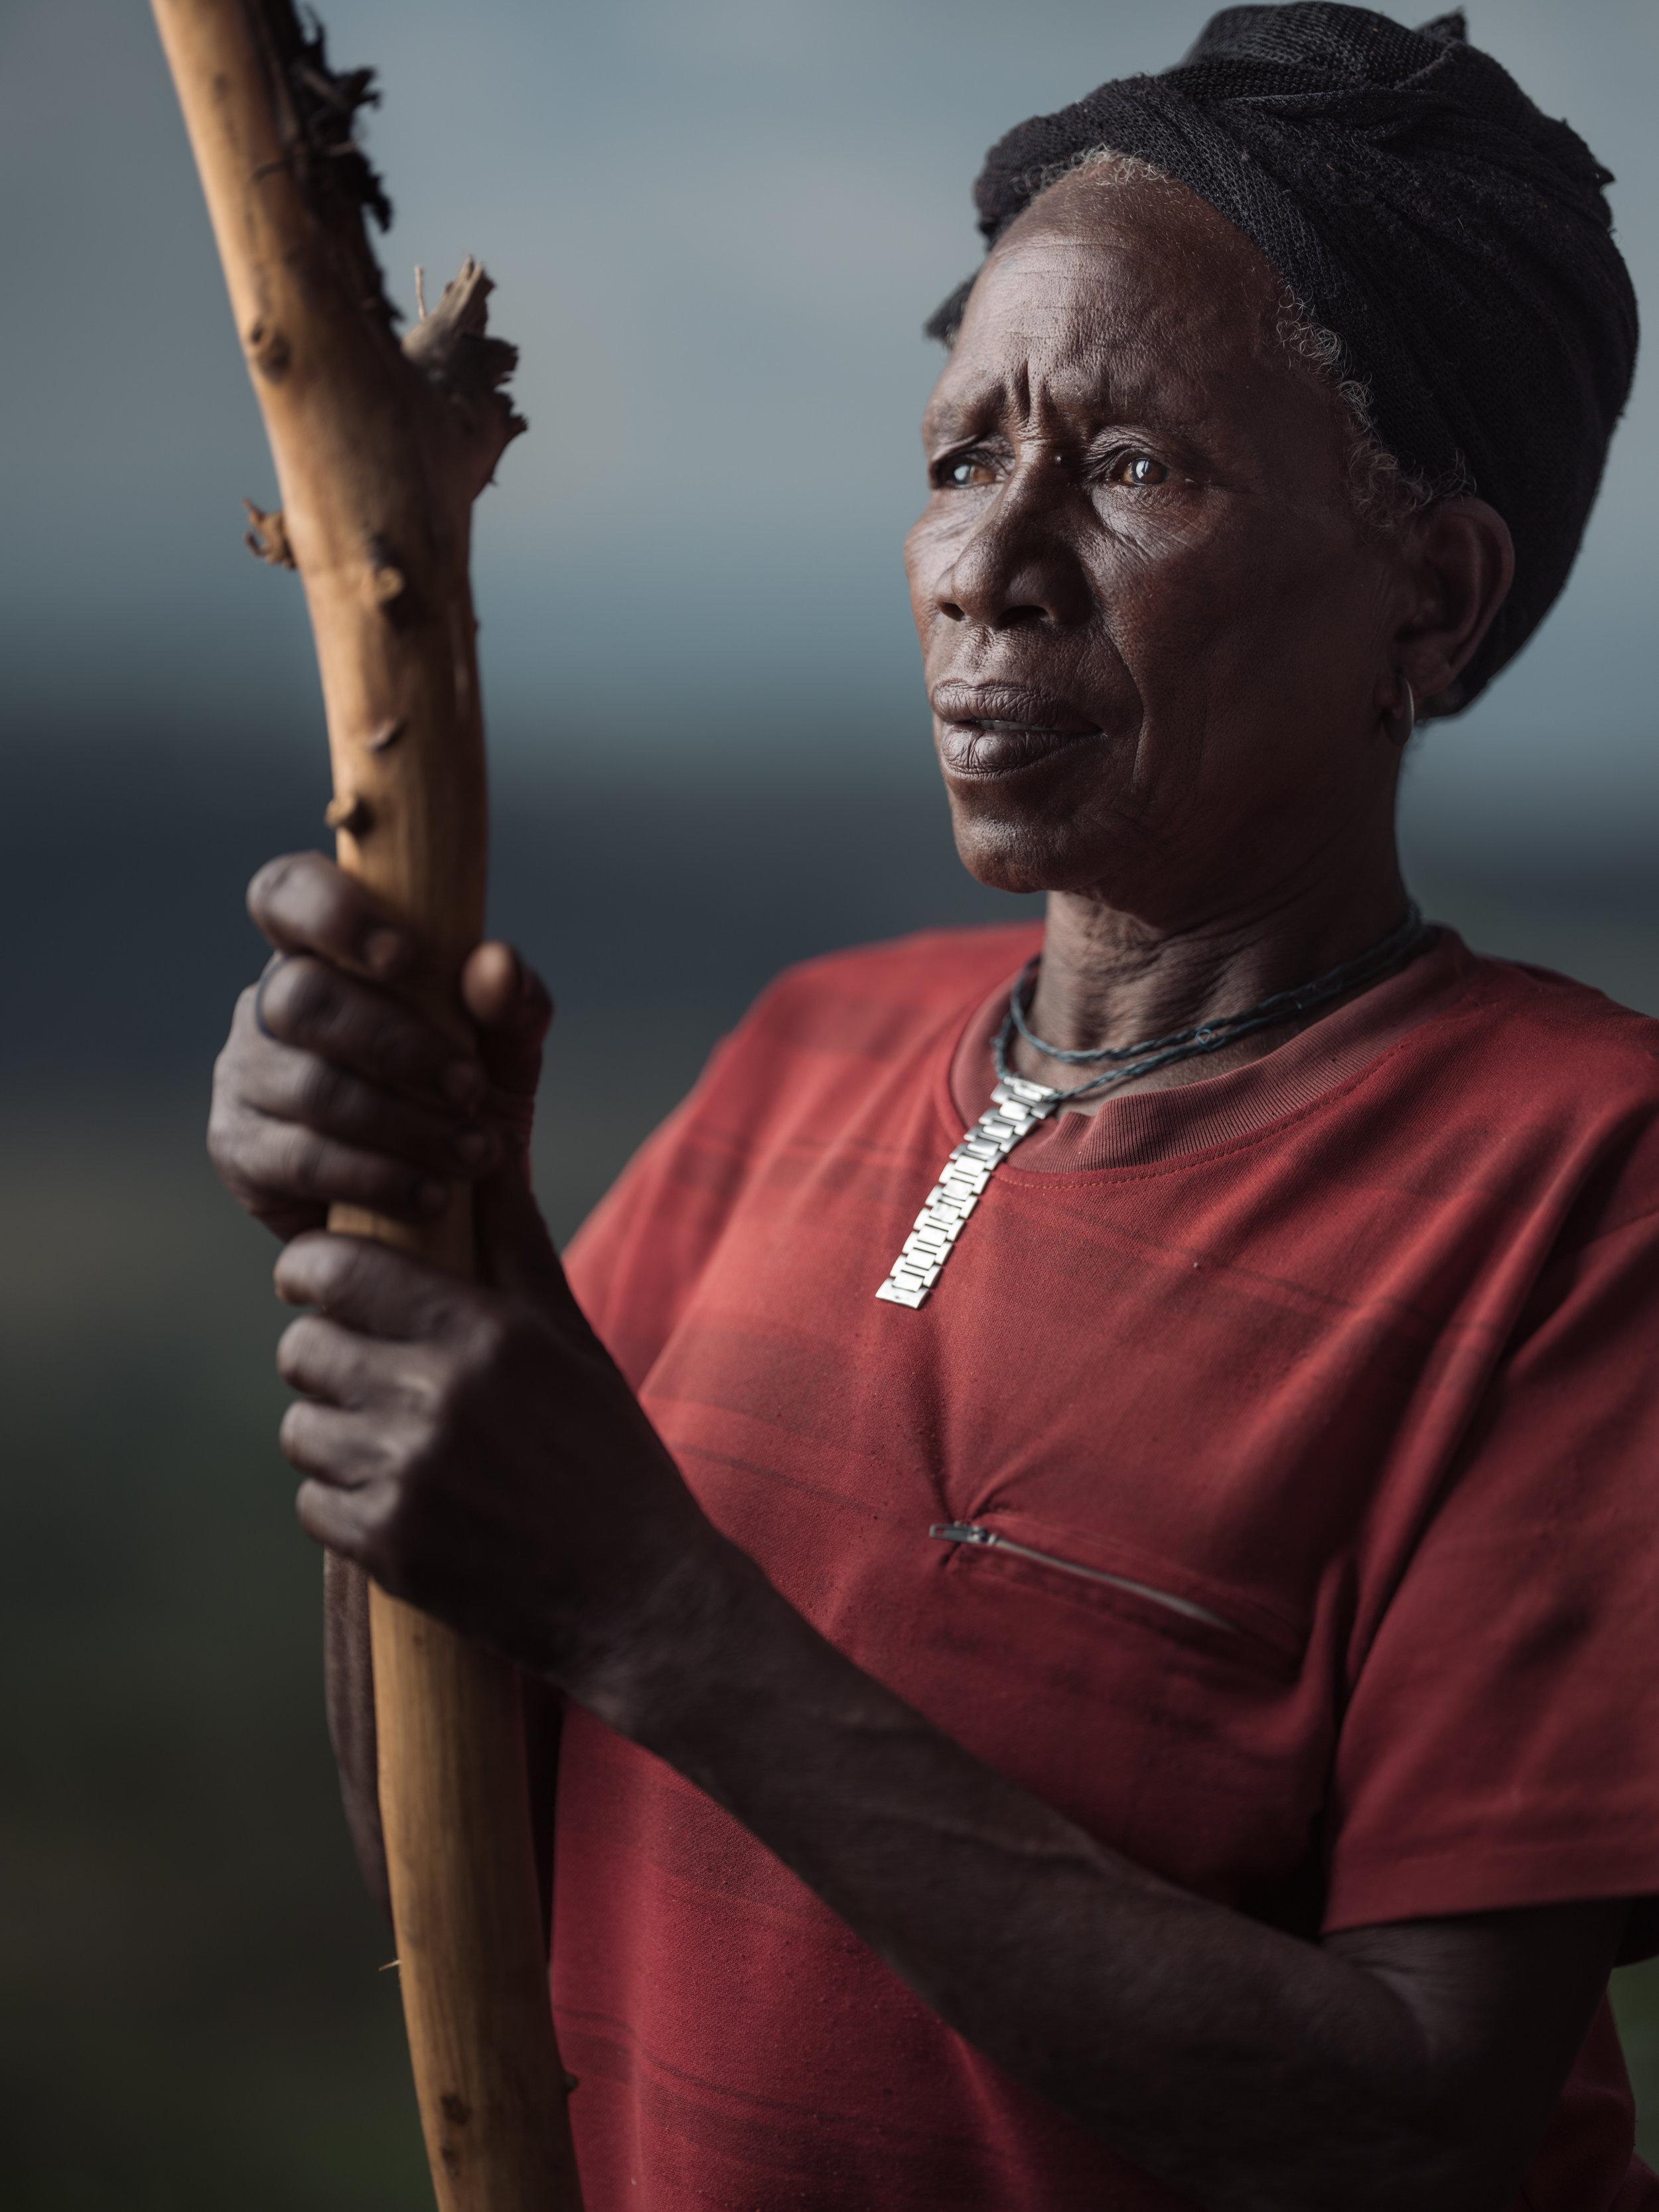 Ethiopia-Starling-PietVandenEynde_007.jpg